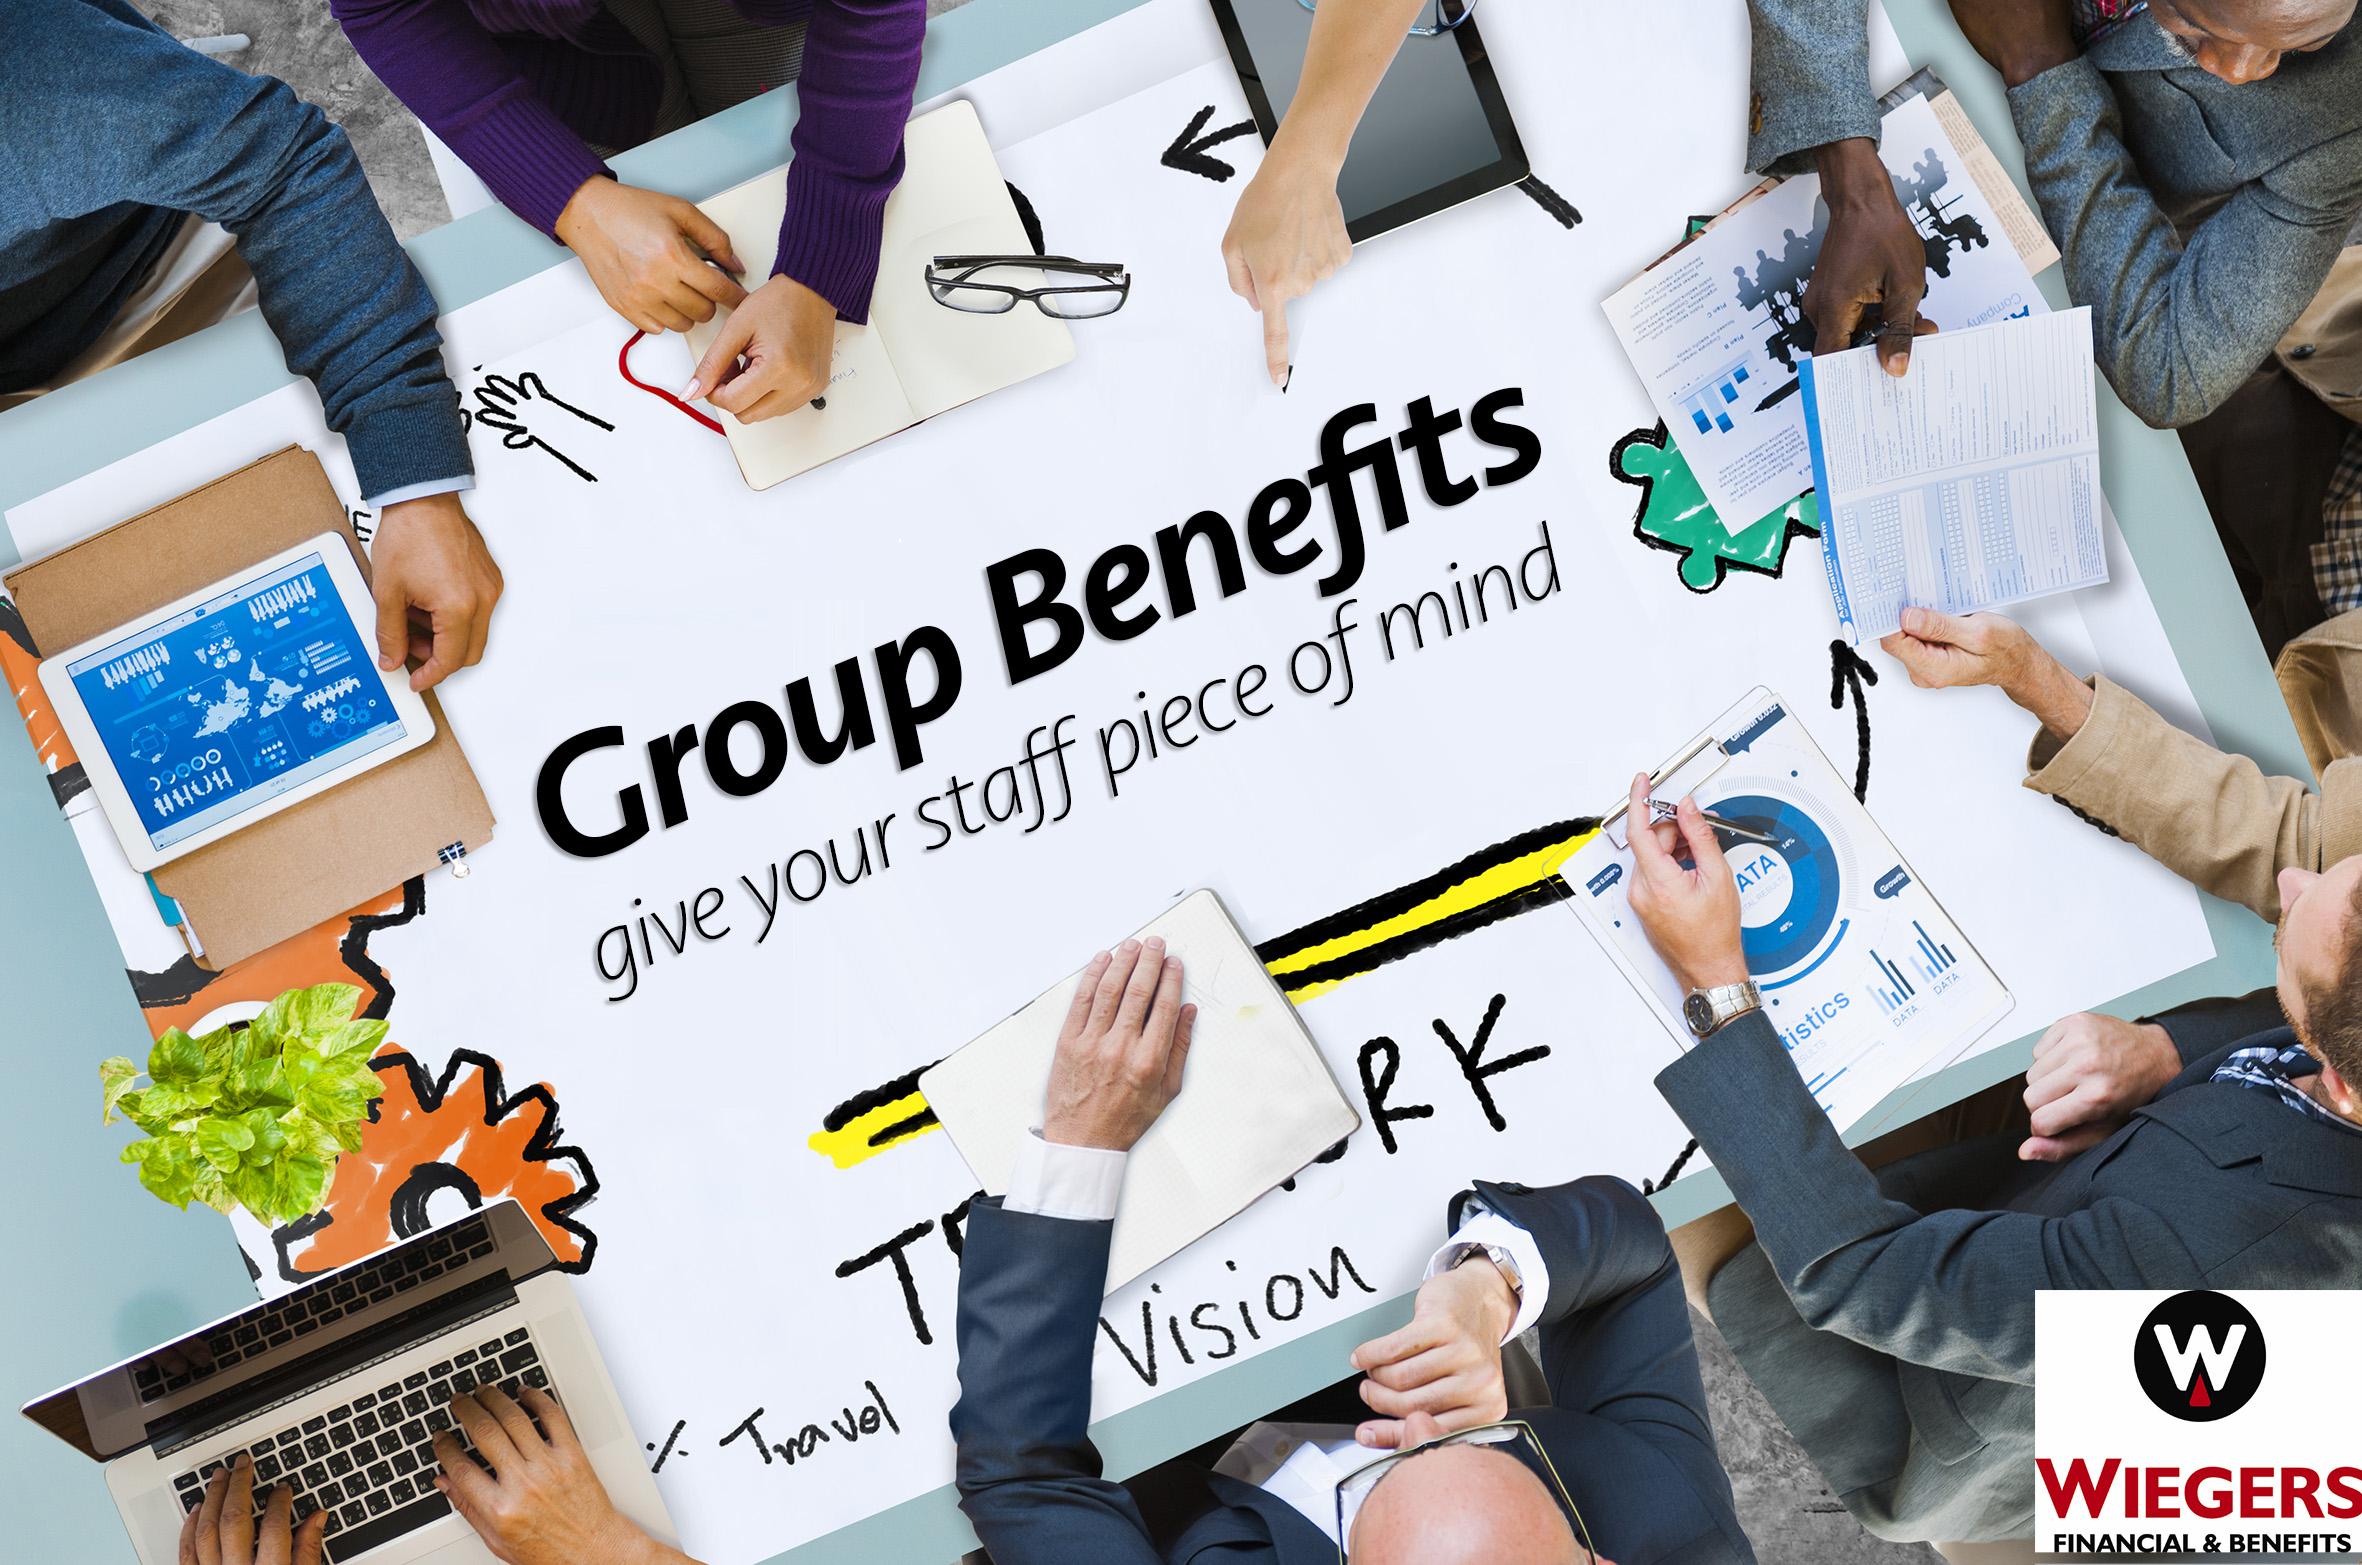 Group Benefits Saskatoon